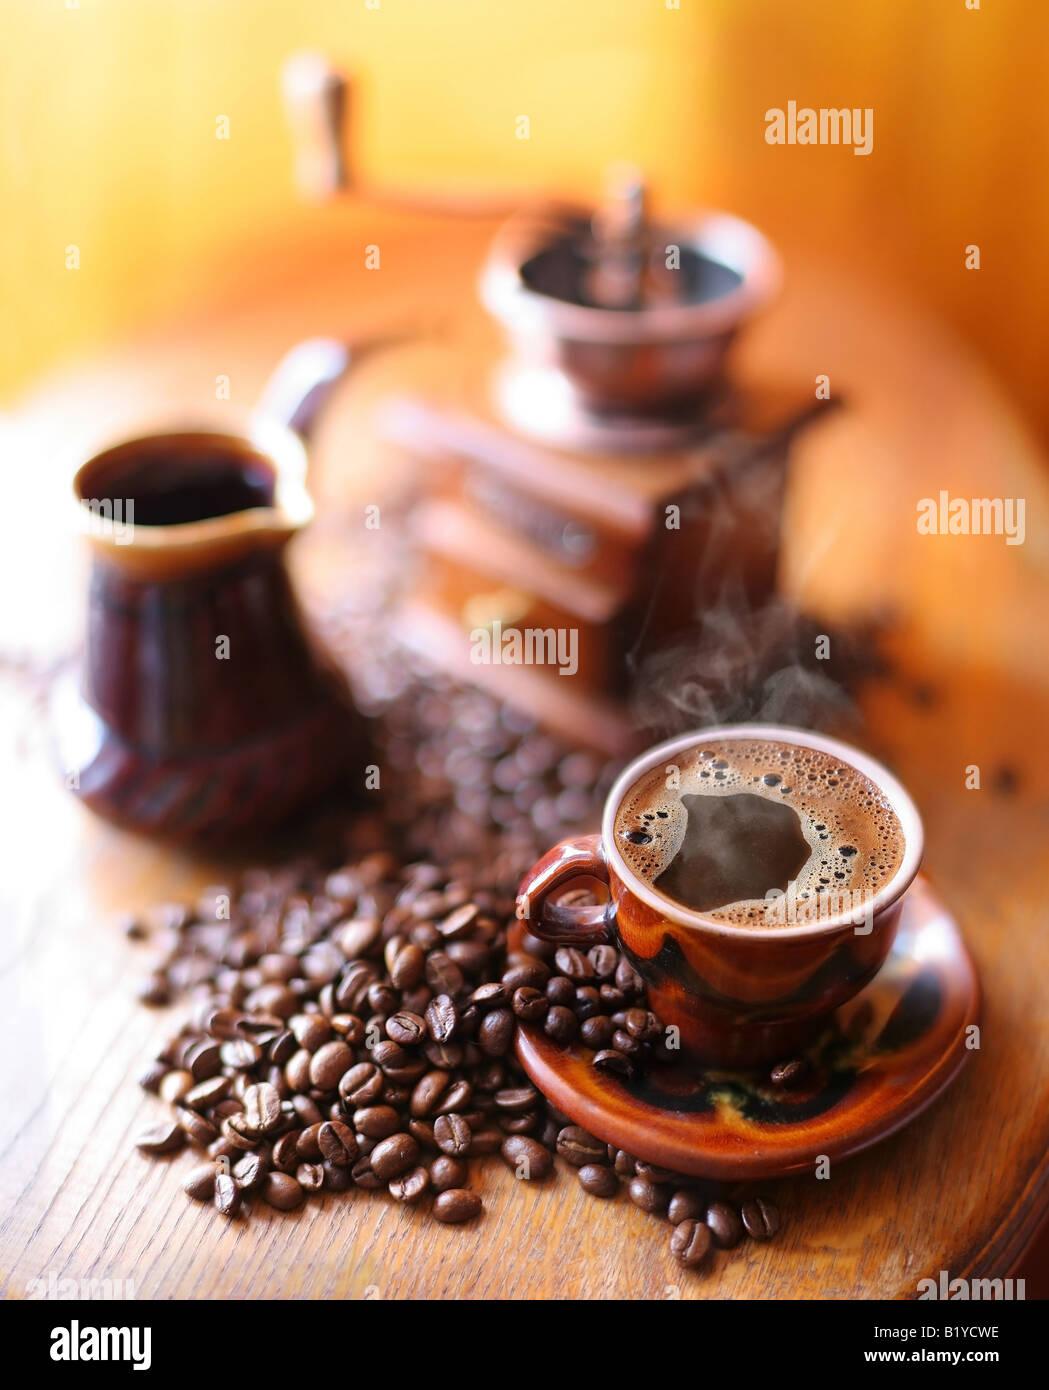 coffee still life - Stock Image